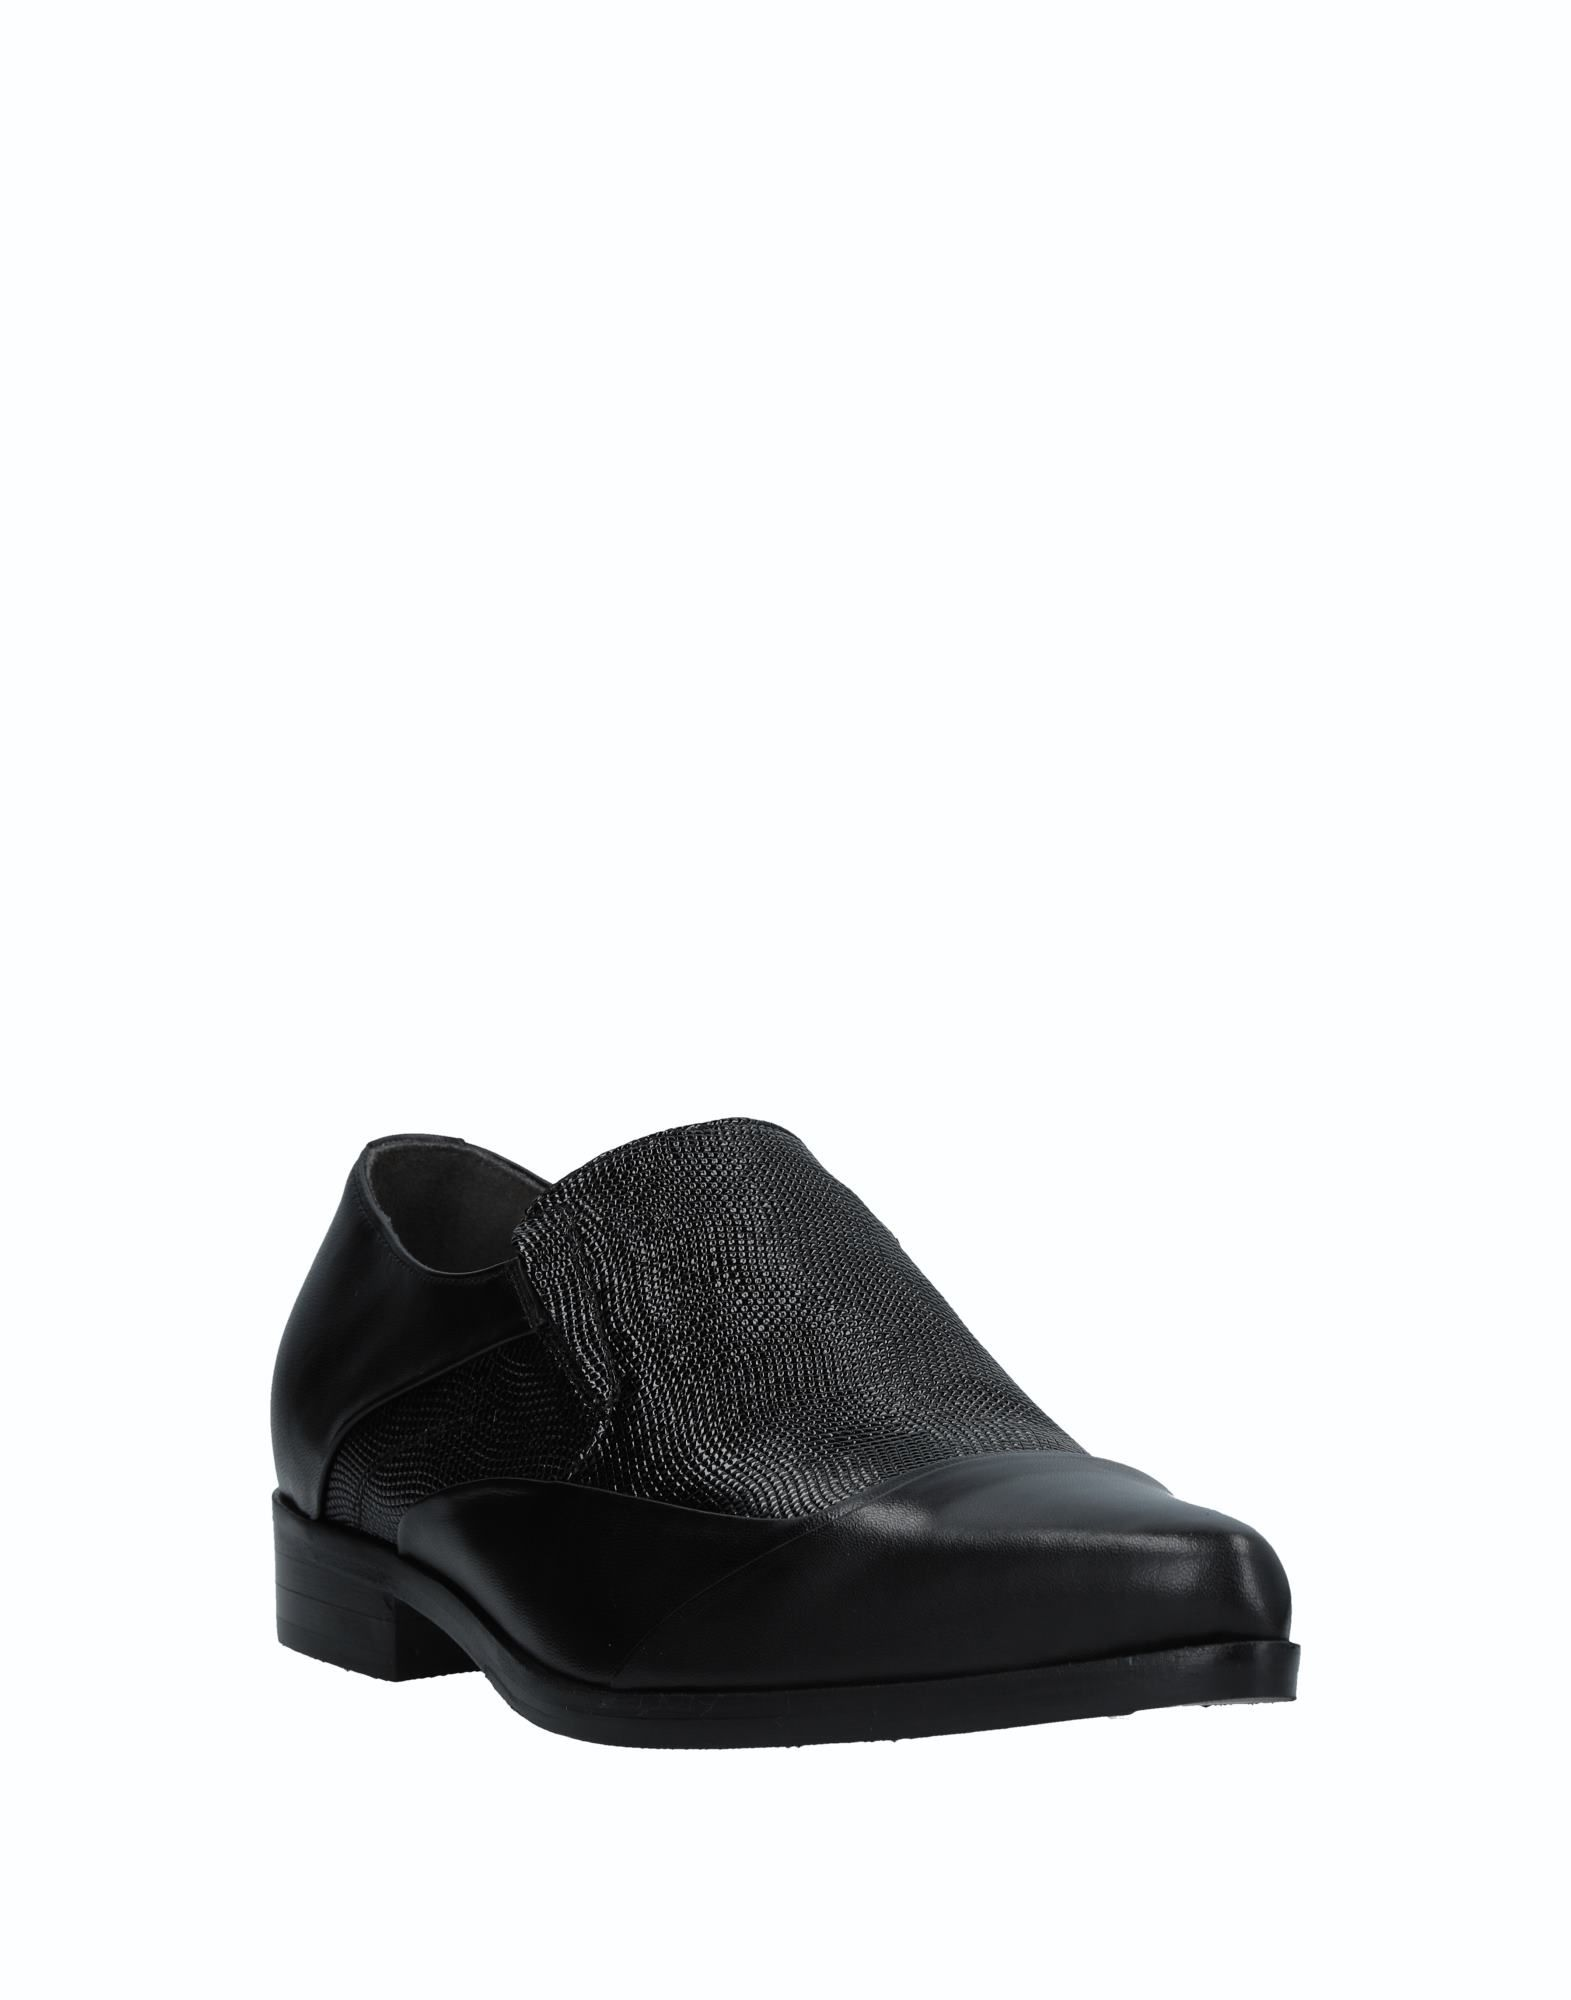 Giovanni Conti Gute Mokassins Herren  11519390QL Gute Conti Qualität beliebte Schuhe f76e2b